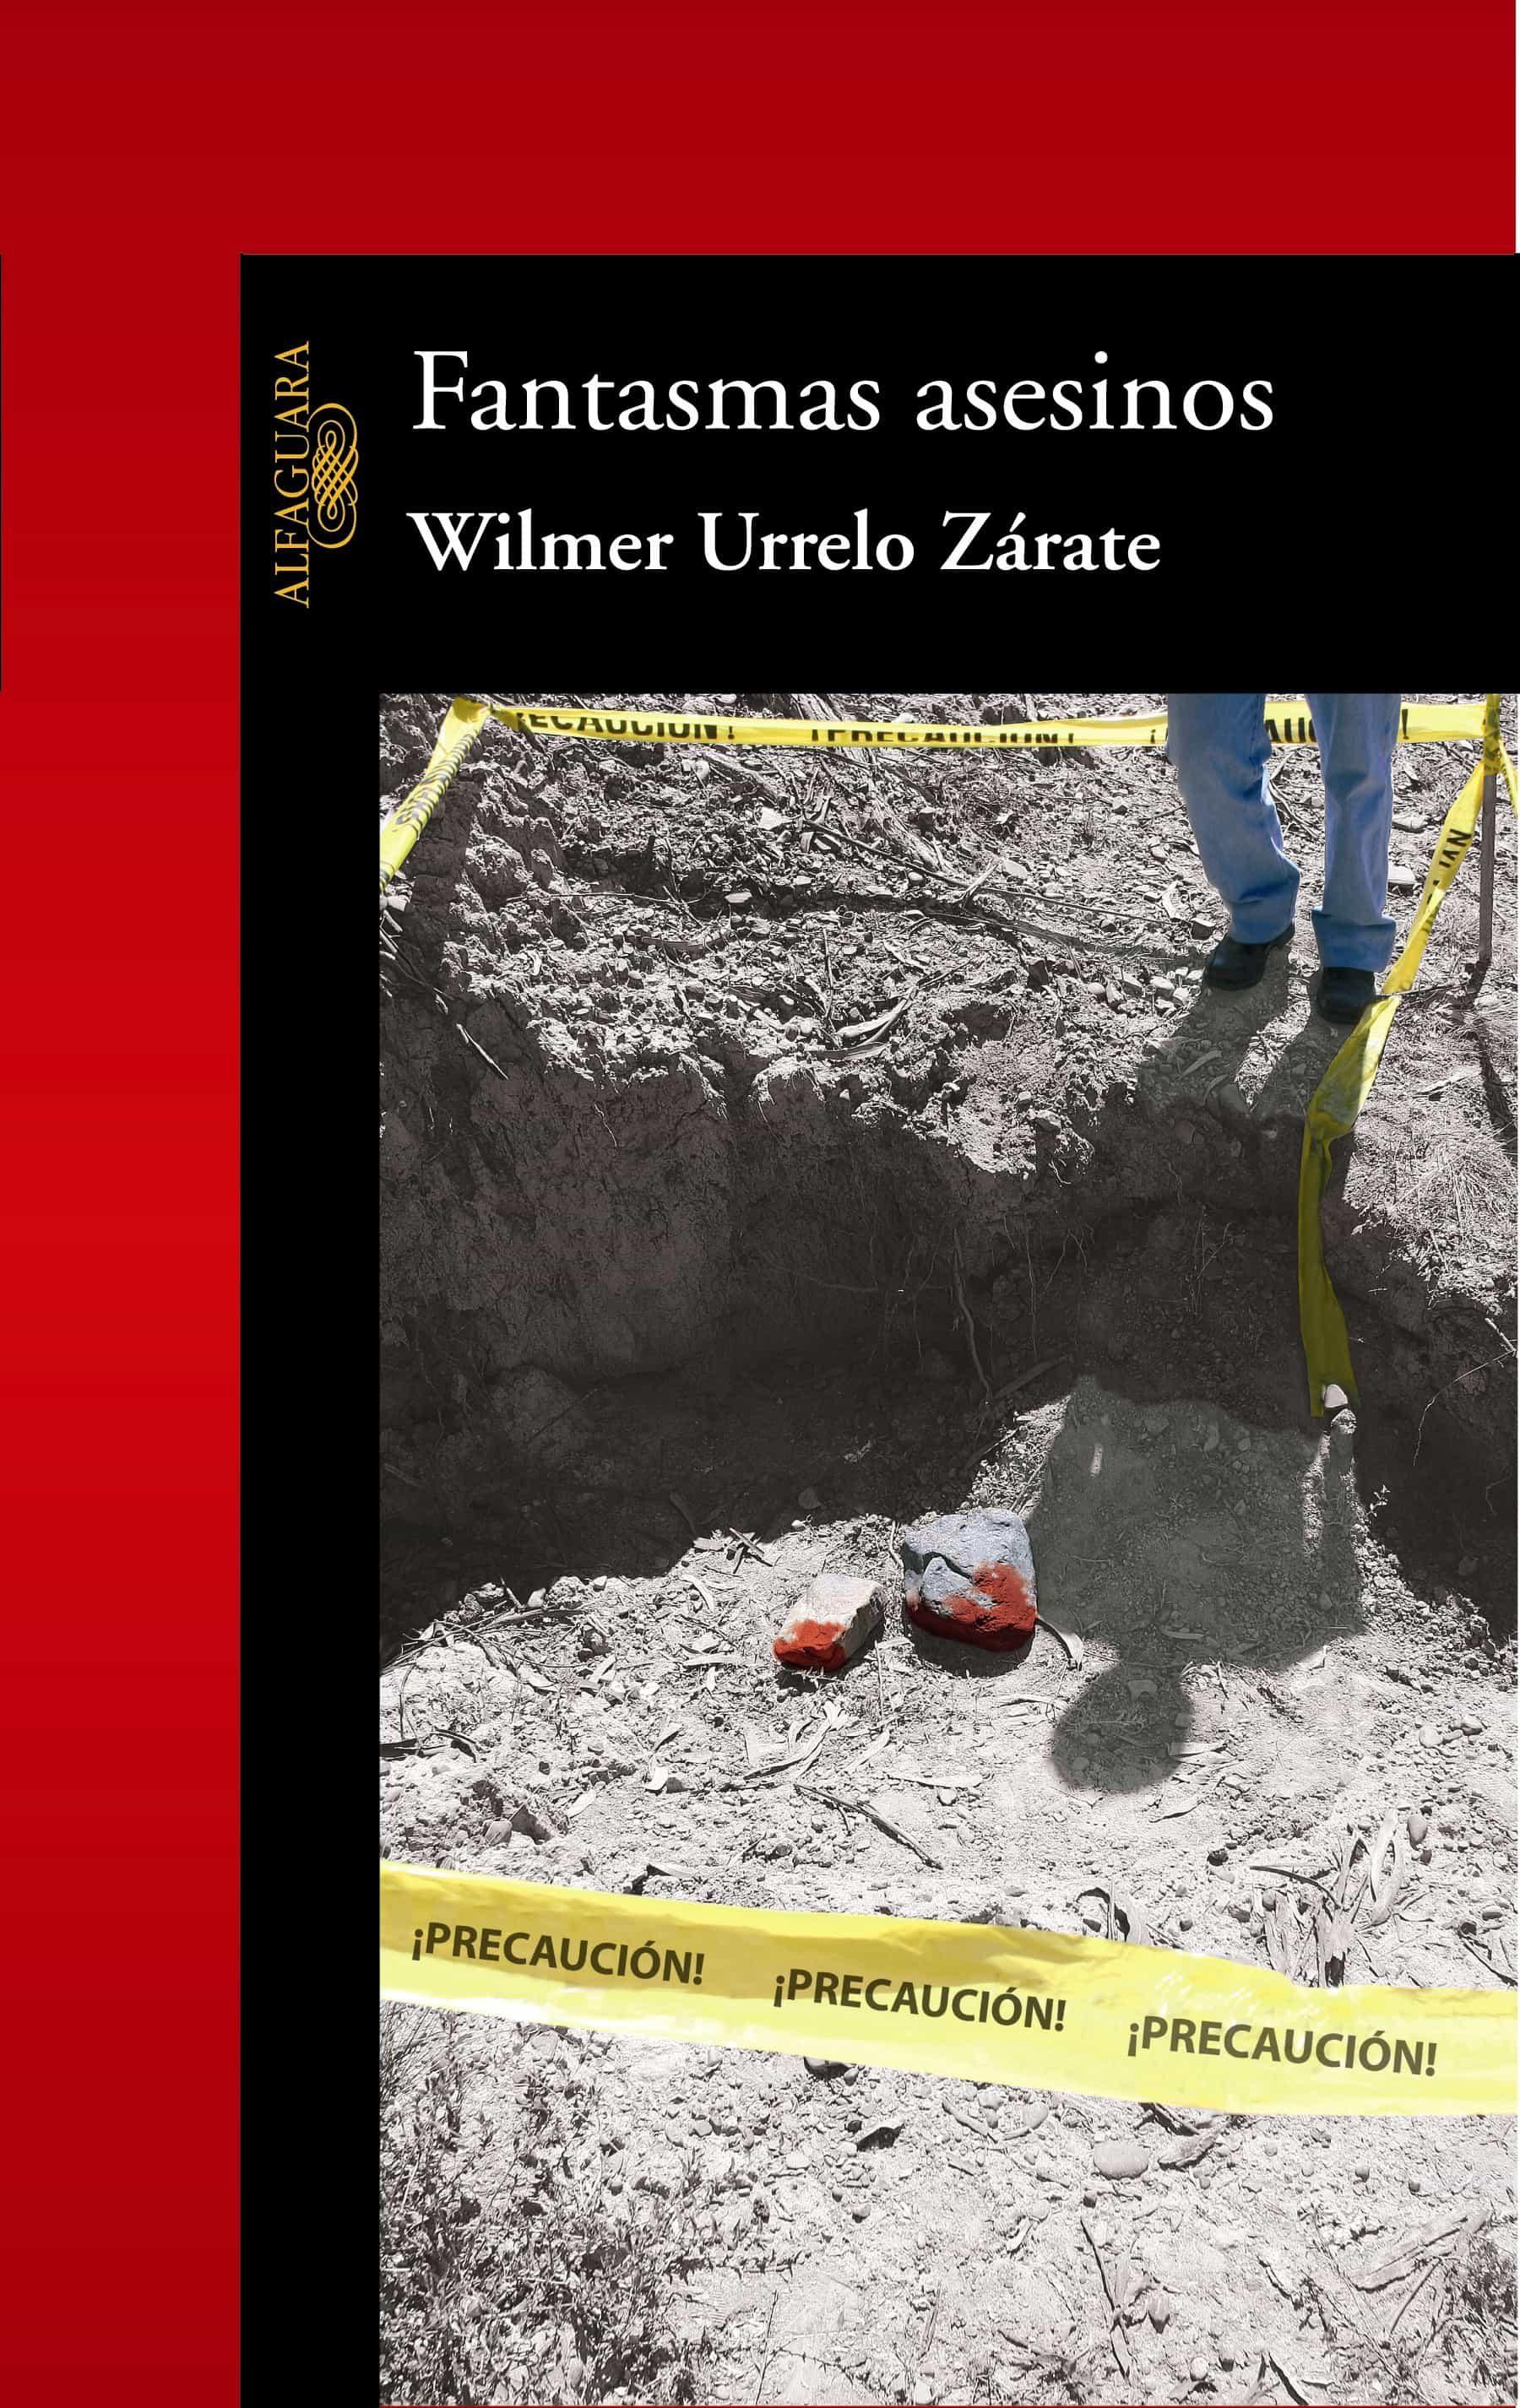 FANTASMAS ASESINOS EBOOK   WILMER URRELO ZARATE   Descargar libro ...